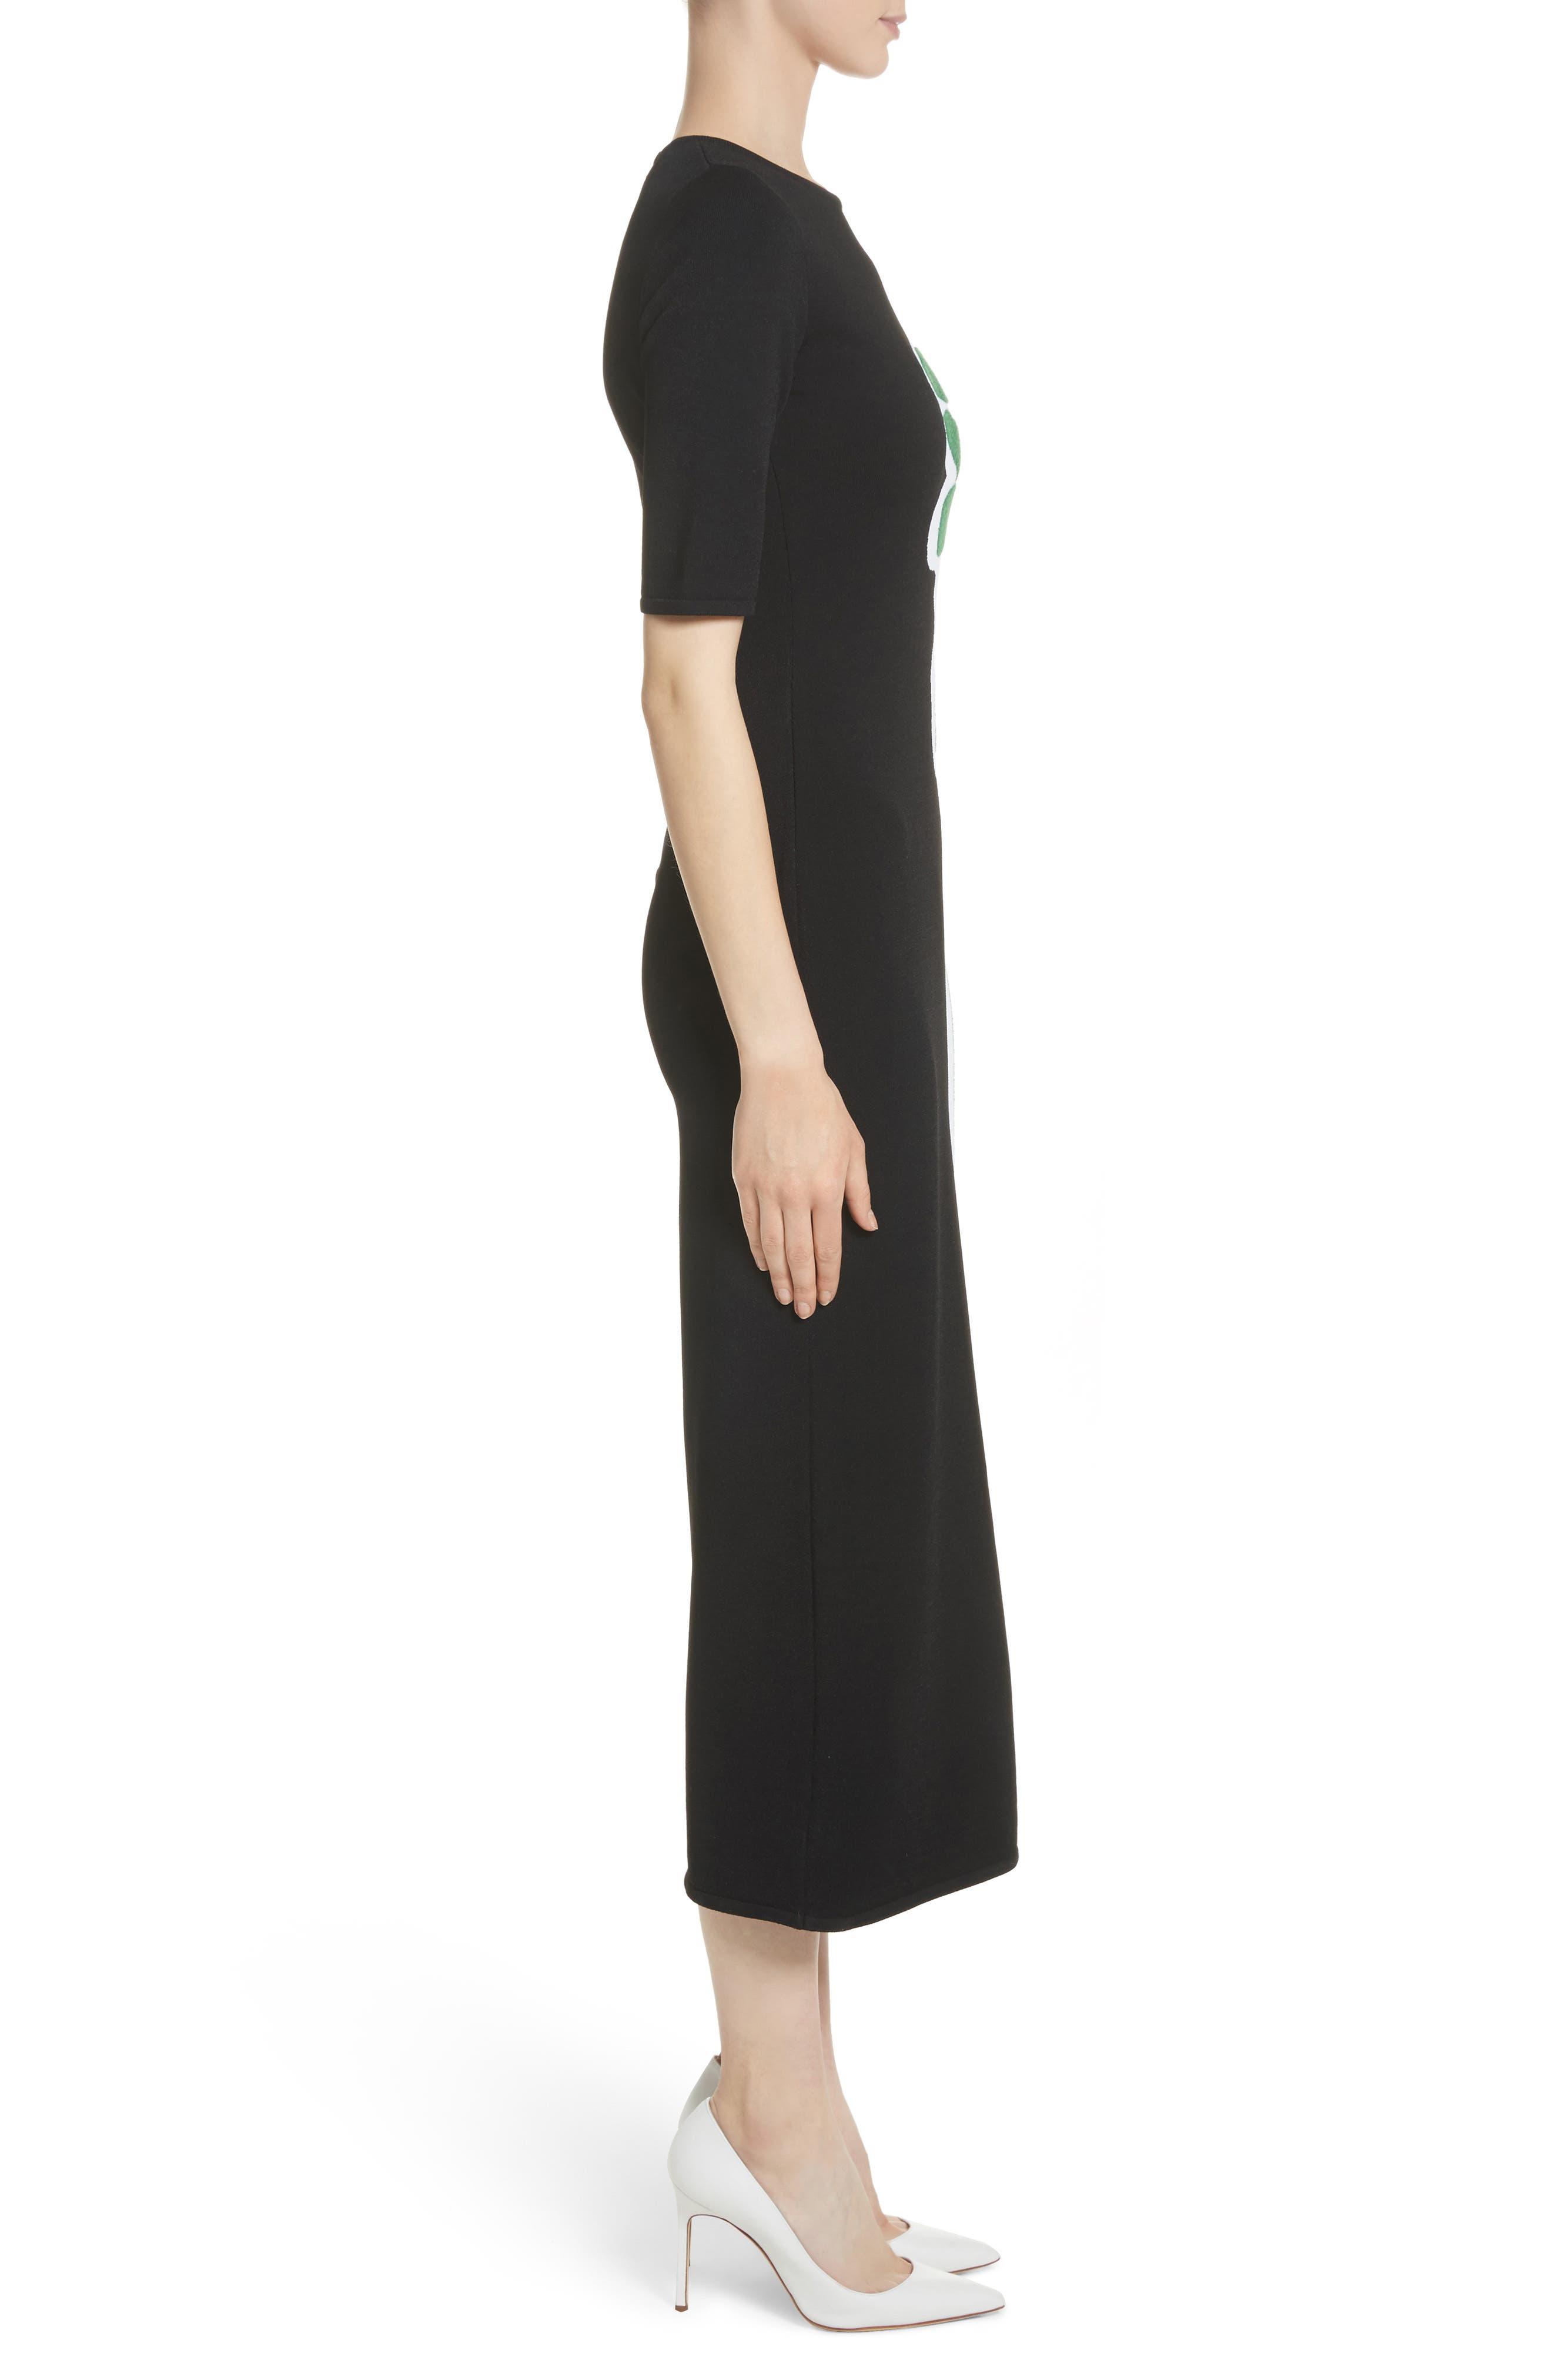 Intarsia Leaf Print Dress,                             Alternate thumbnail 3, color,                             White/ Black/ Evergreen